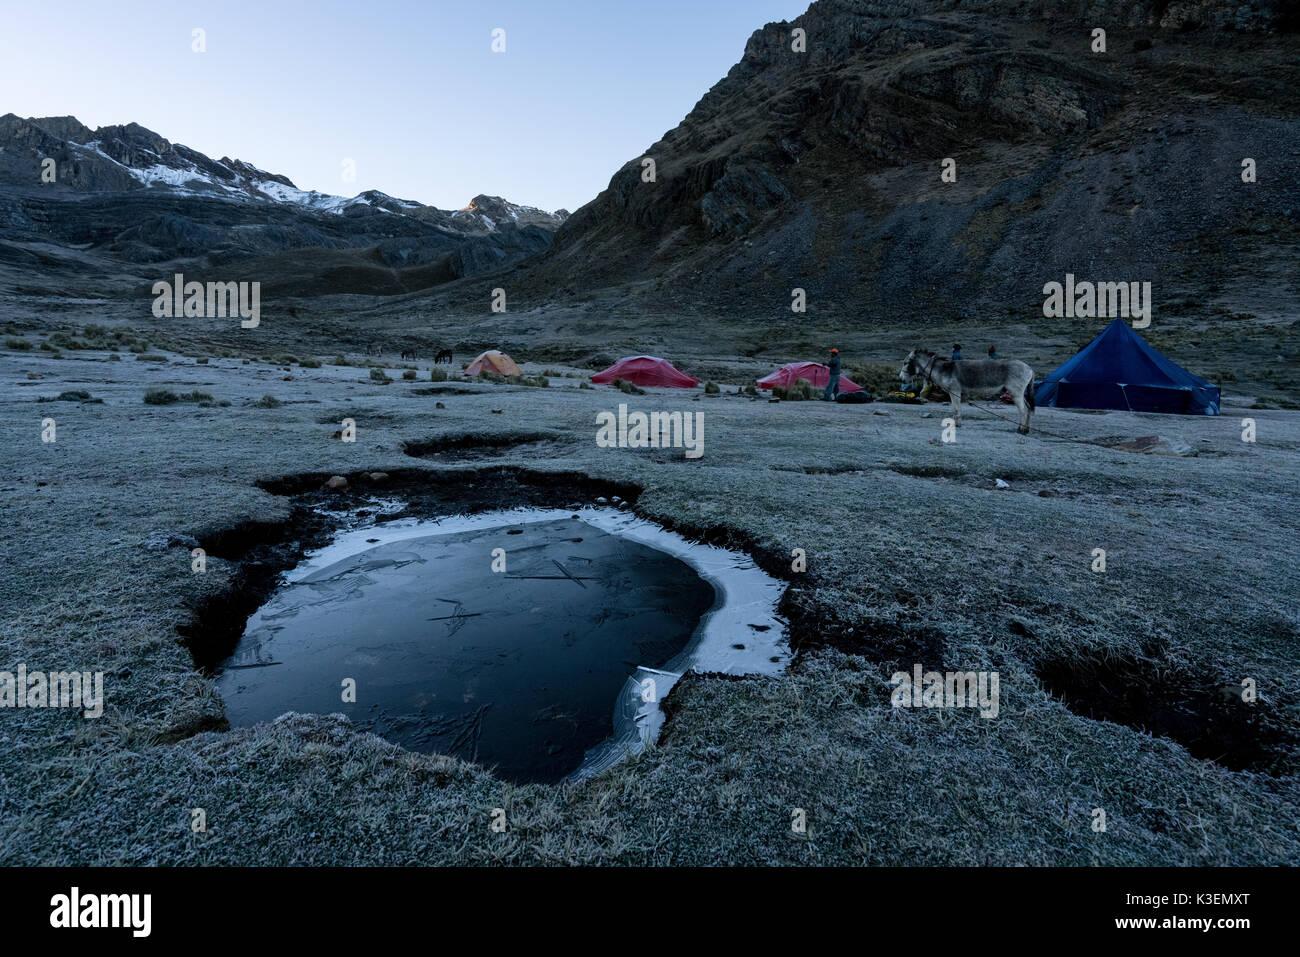 Aube naître sur la cordillère Huayhuash trek, Pérou Photo Stock